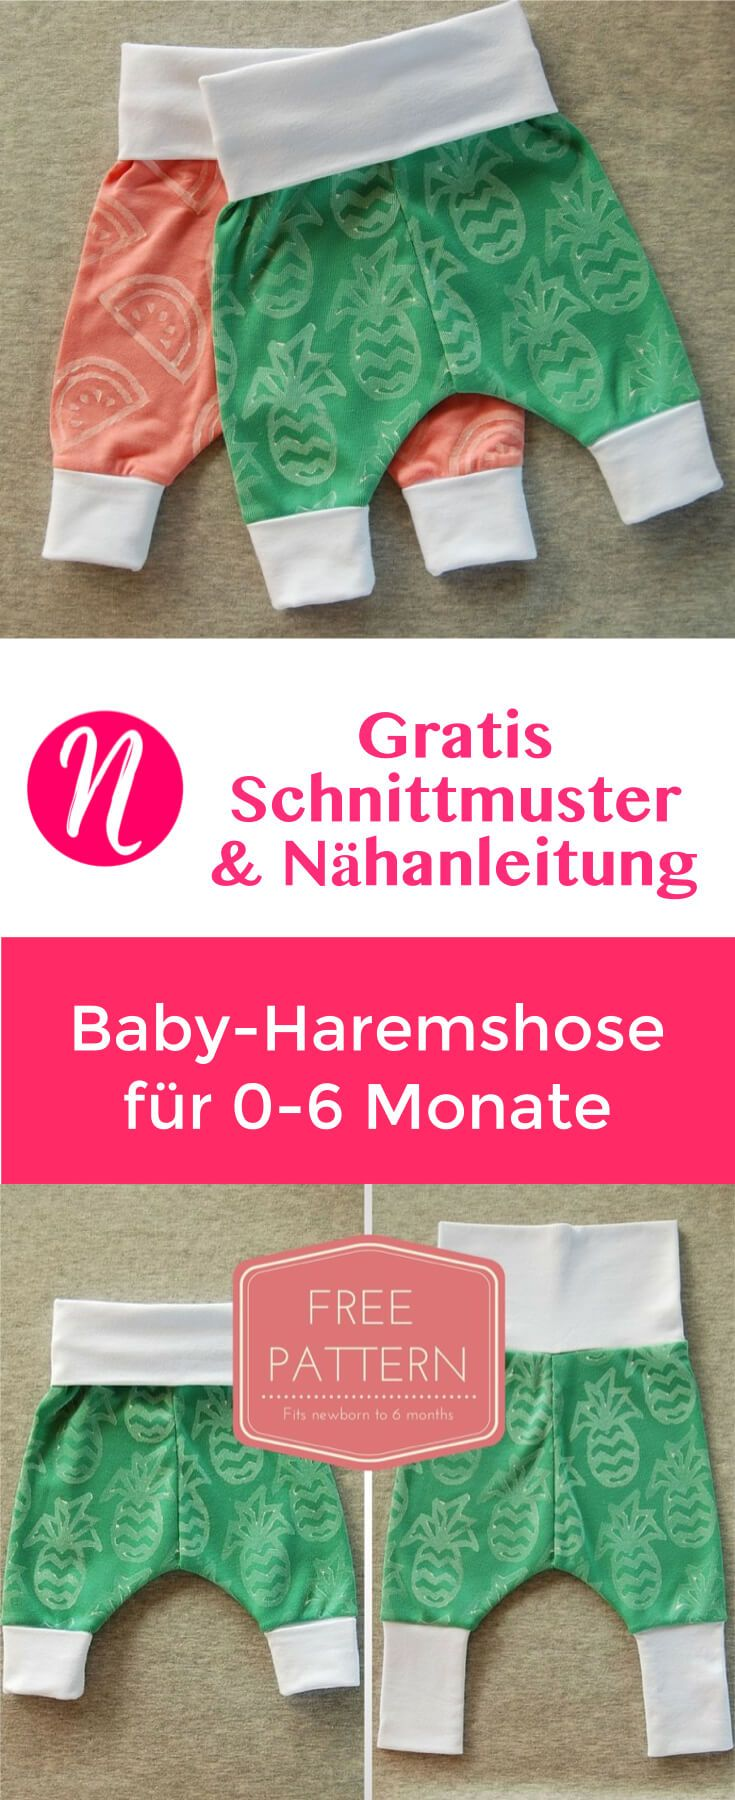 Baby-Haremshose